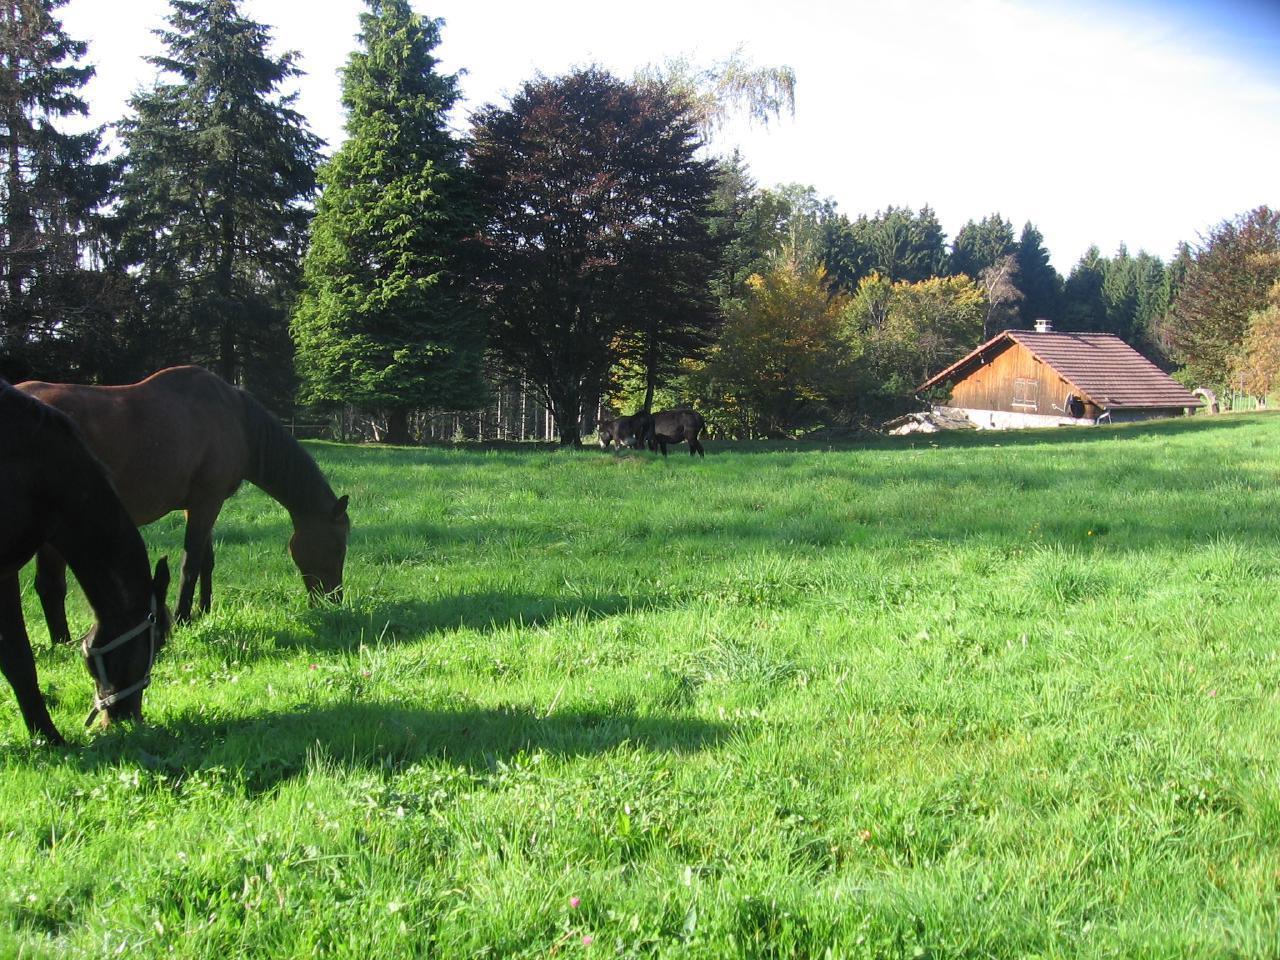 Ferienhaus Steinhäuschen Shila, im Naturparc der Vogesen,  mit Saunahaus (1717460), La Rosière, Haute-Saône, Franche-Comté, Frankreich, Bild 24